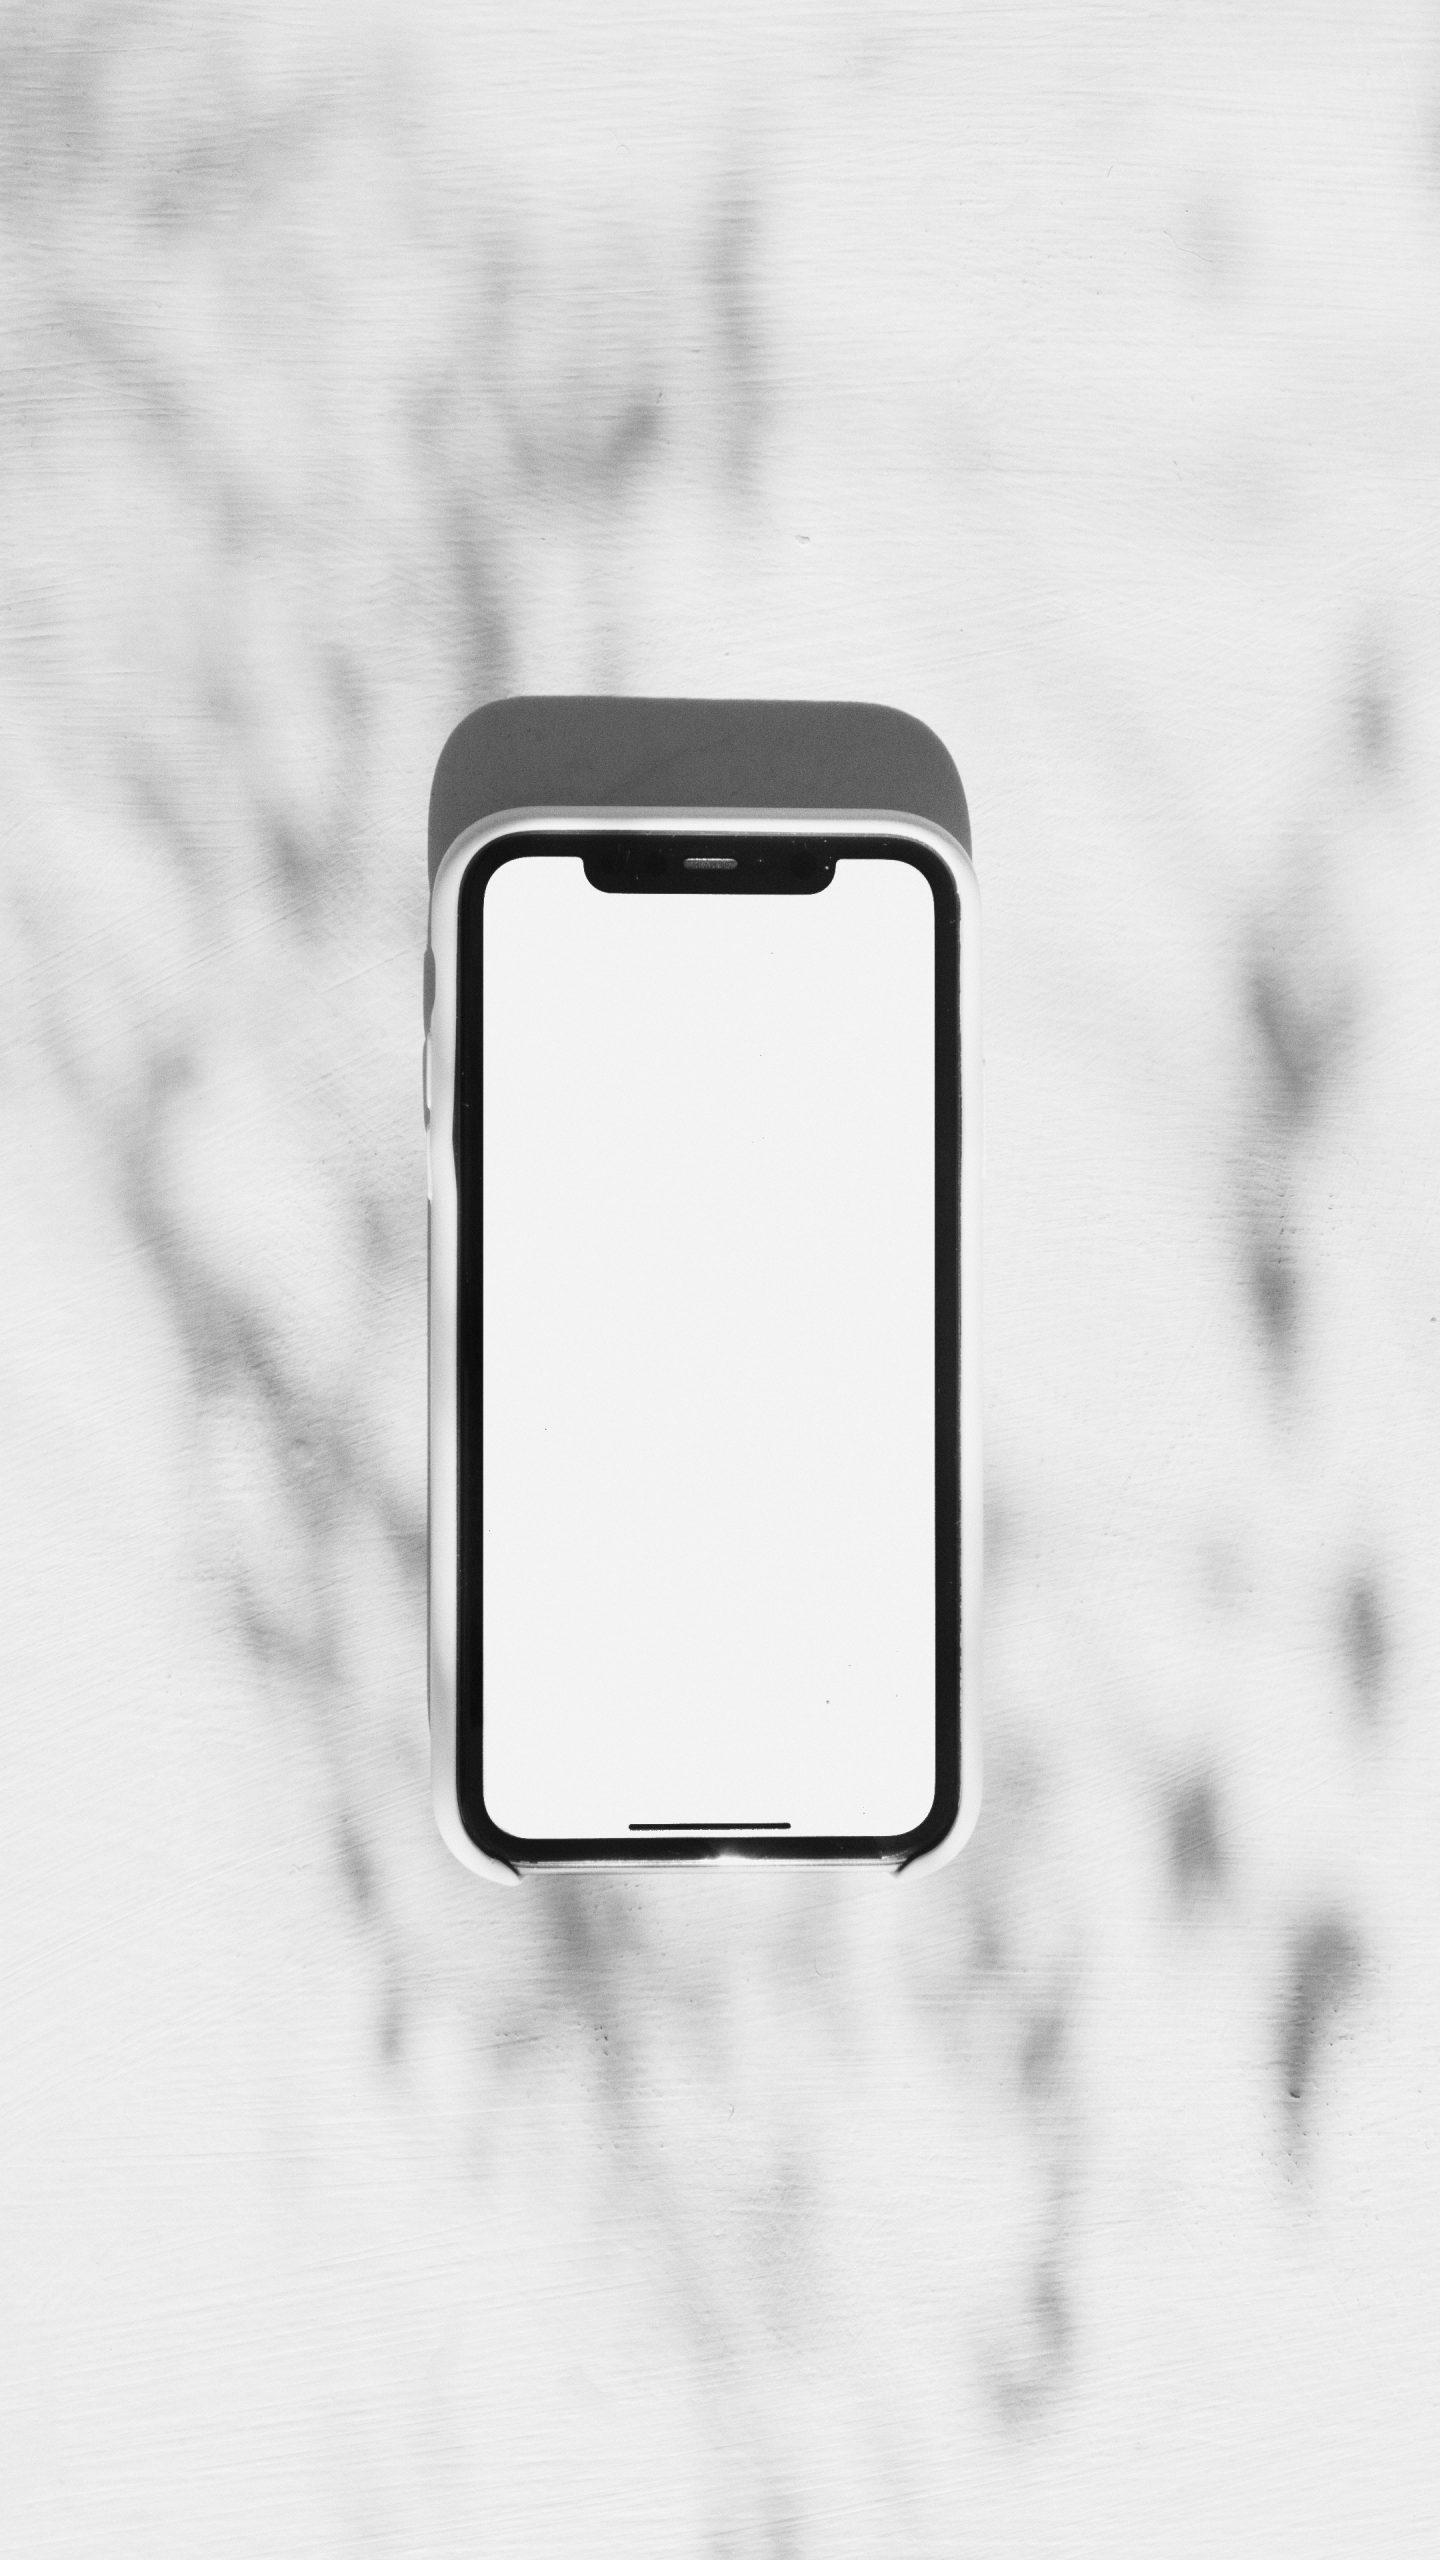 Mobile App Development: Key Legal Considerations